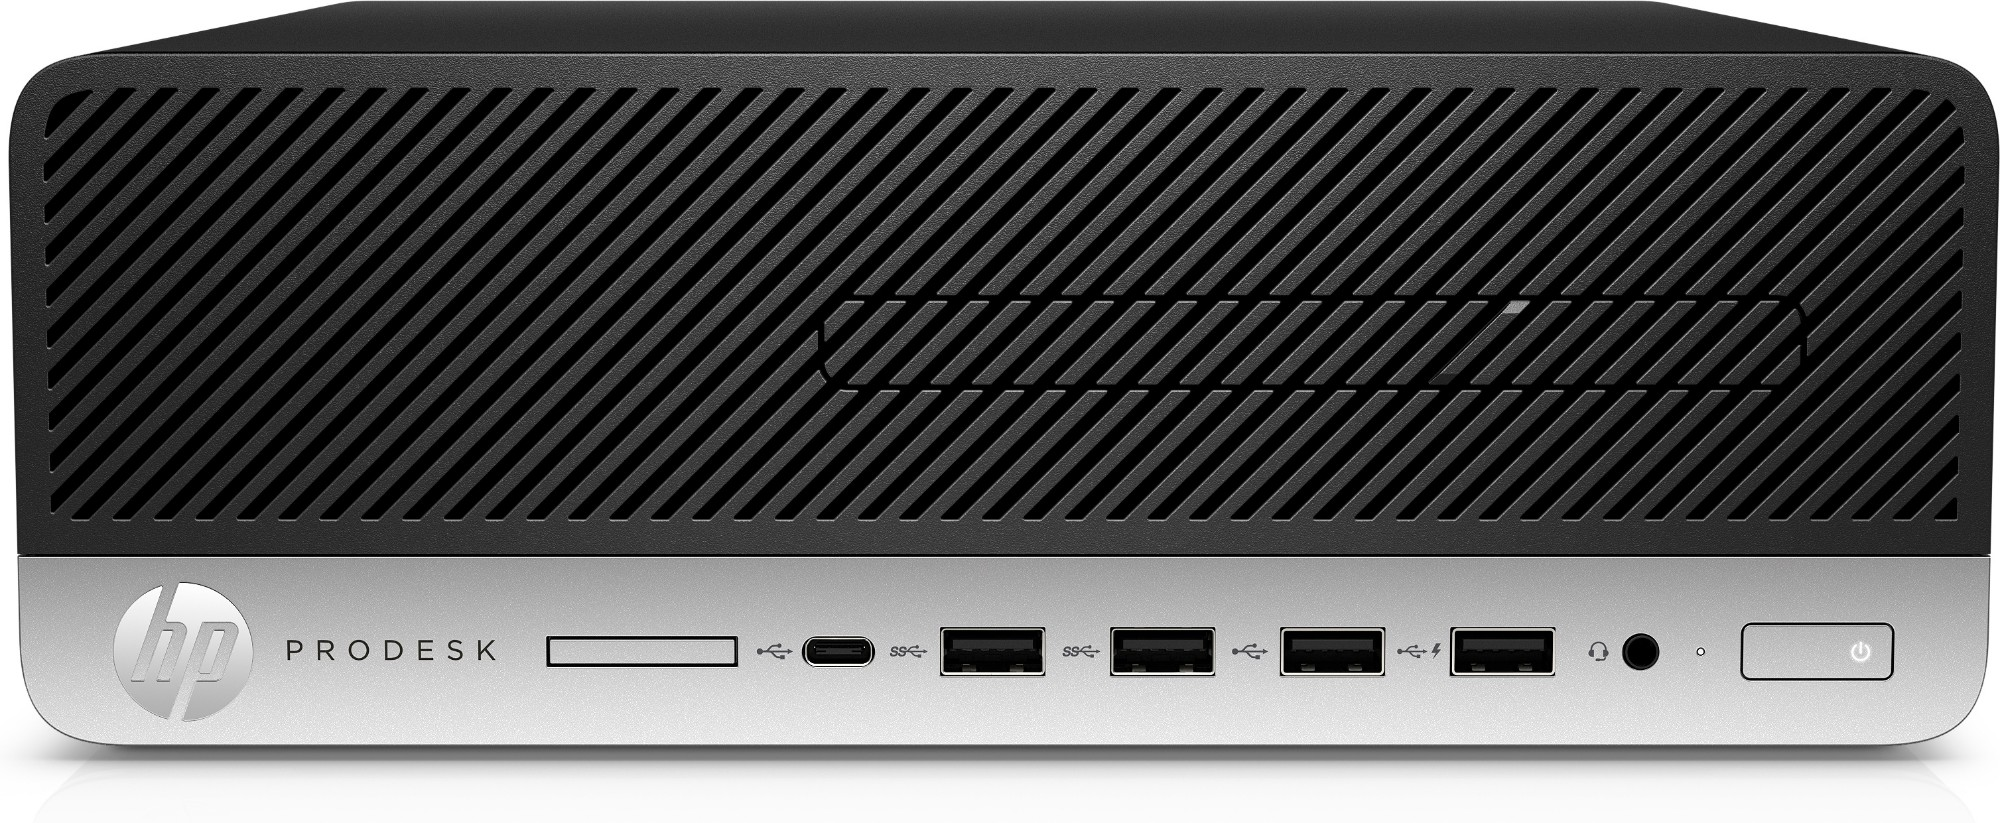 HP ProDesk 600 G5 8th gen Intel® Core™ i5 i5-8500 8 GB DDR4-SDRAM 256 GB SSD Black SFF PC